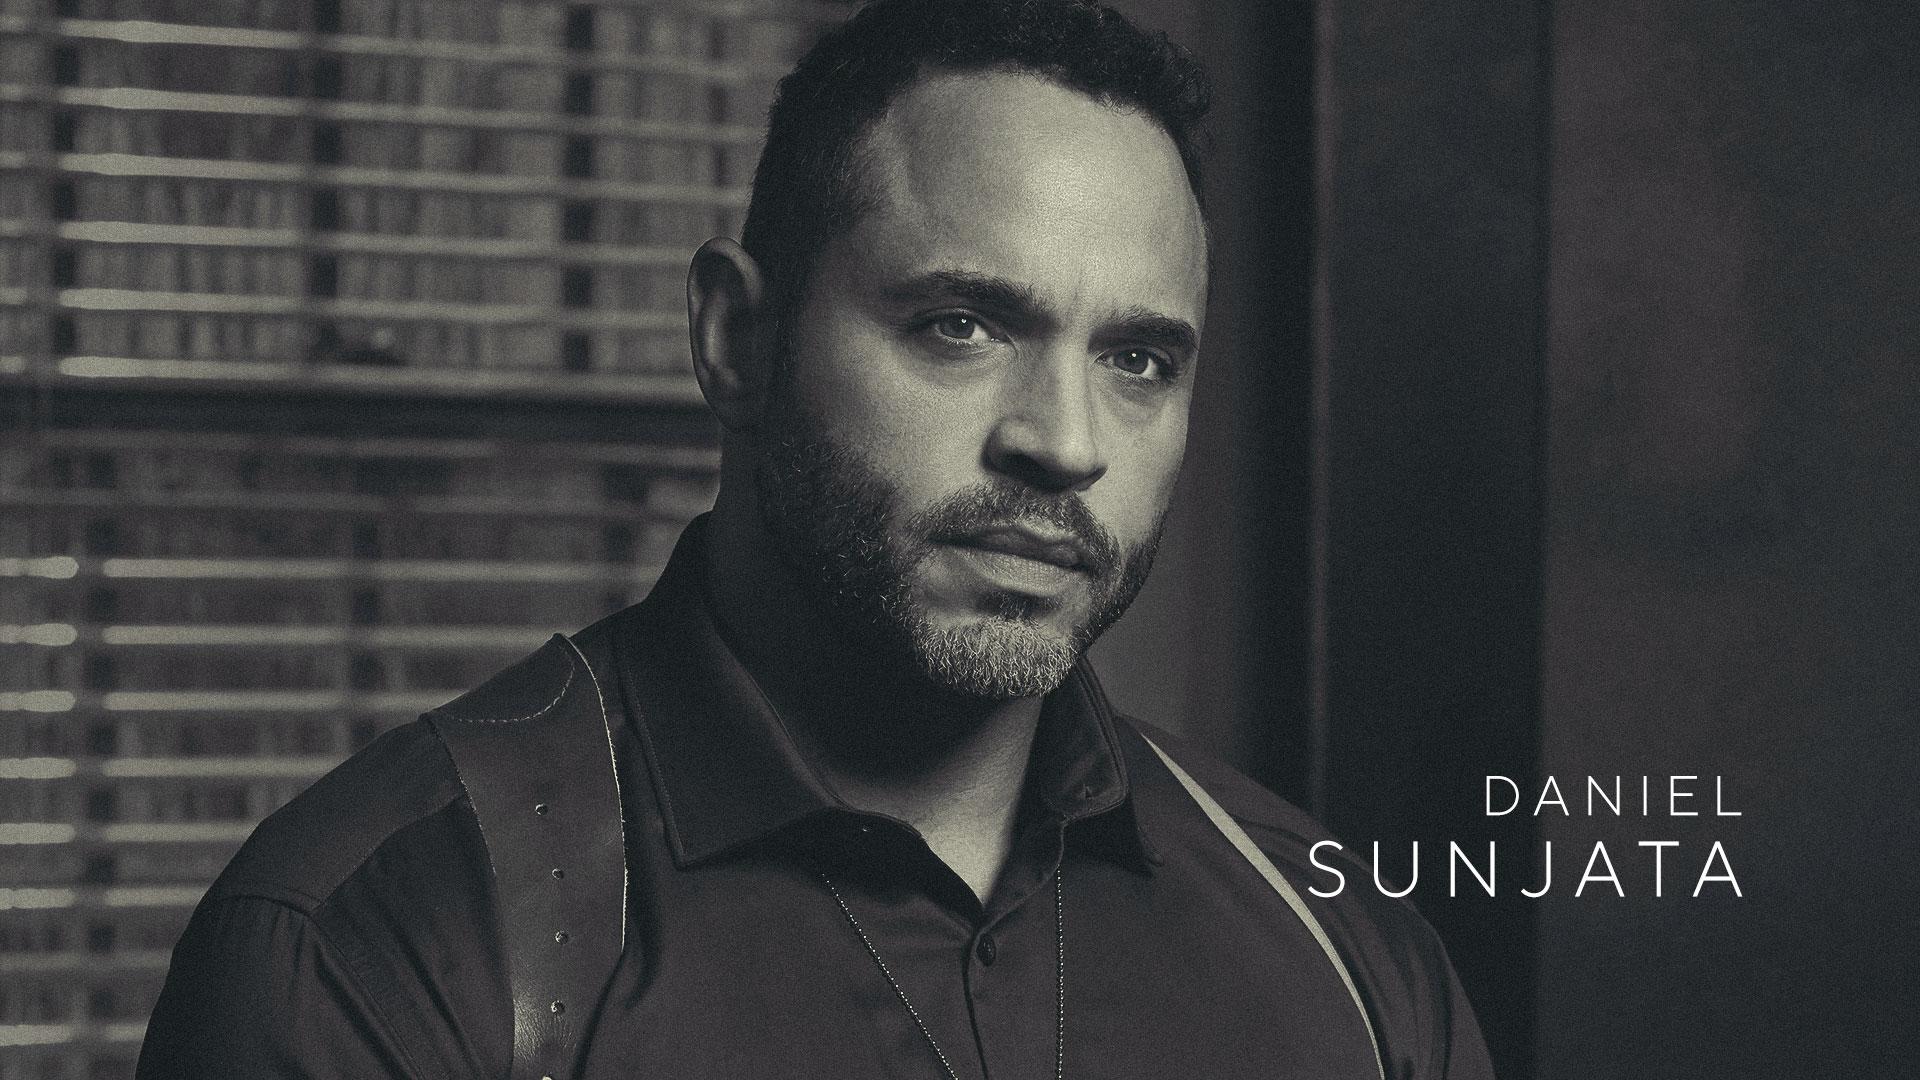 Daniel Sunjata as Detective Reece in